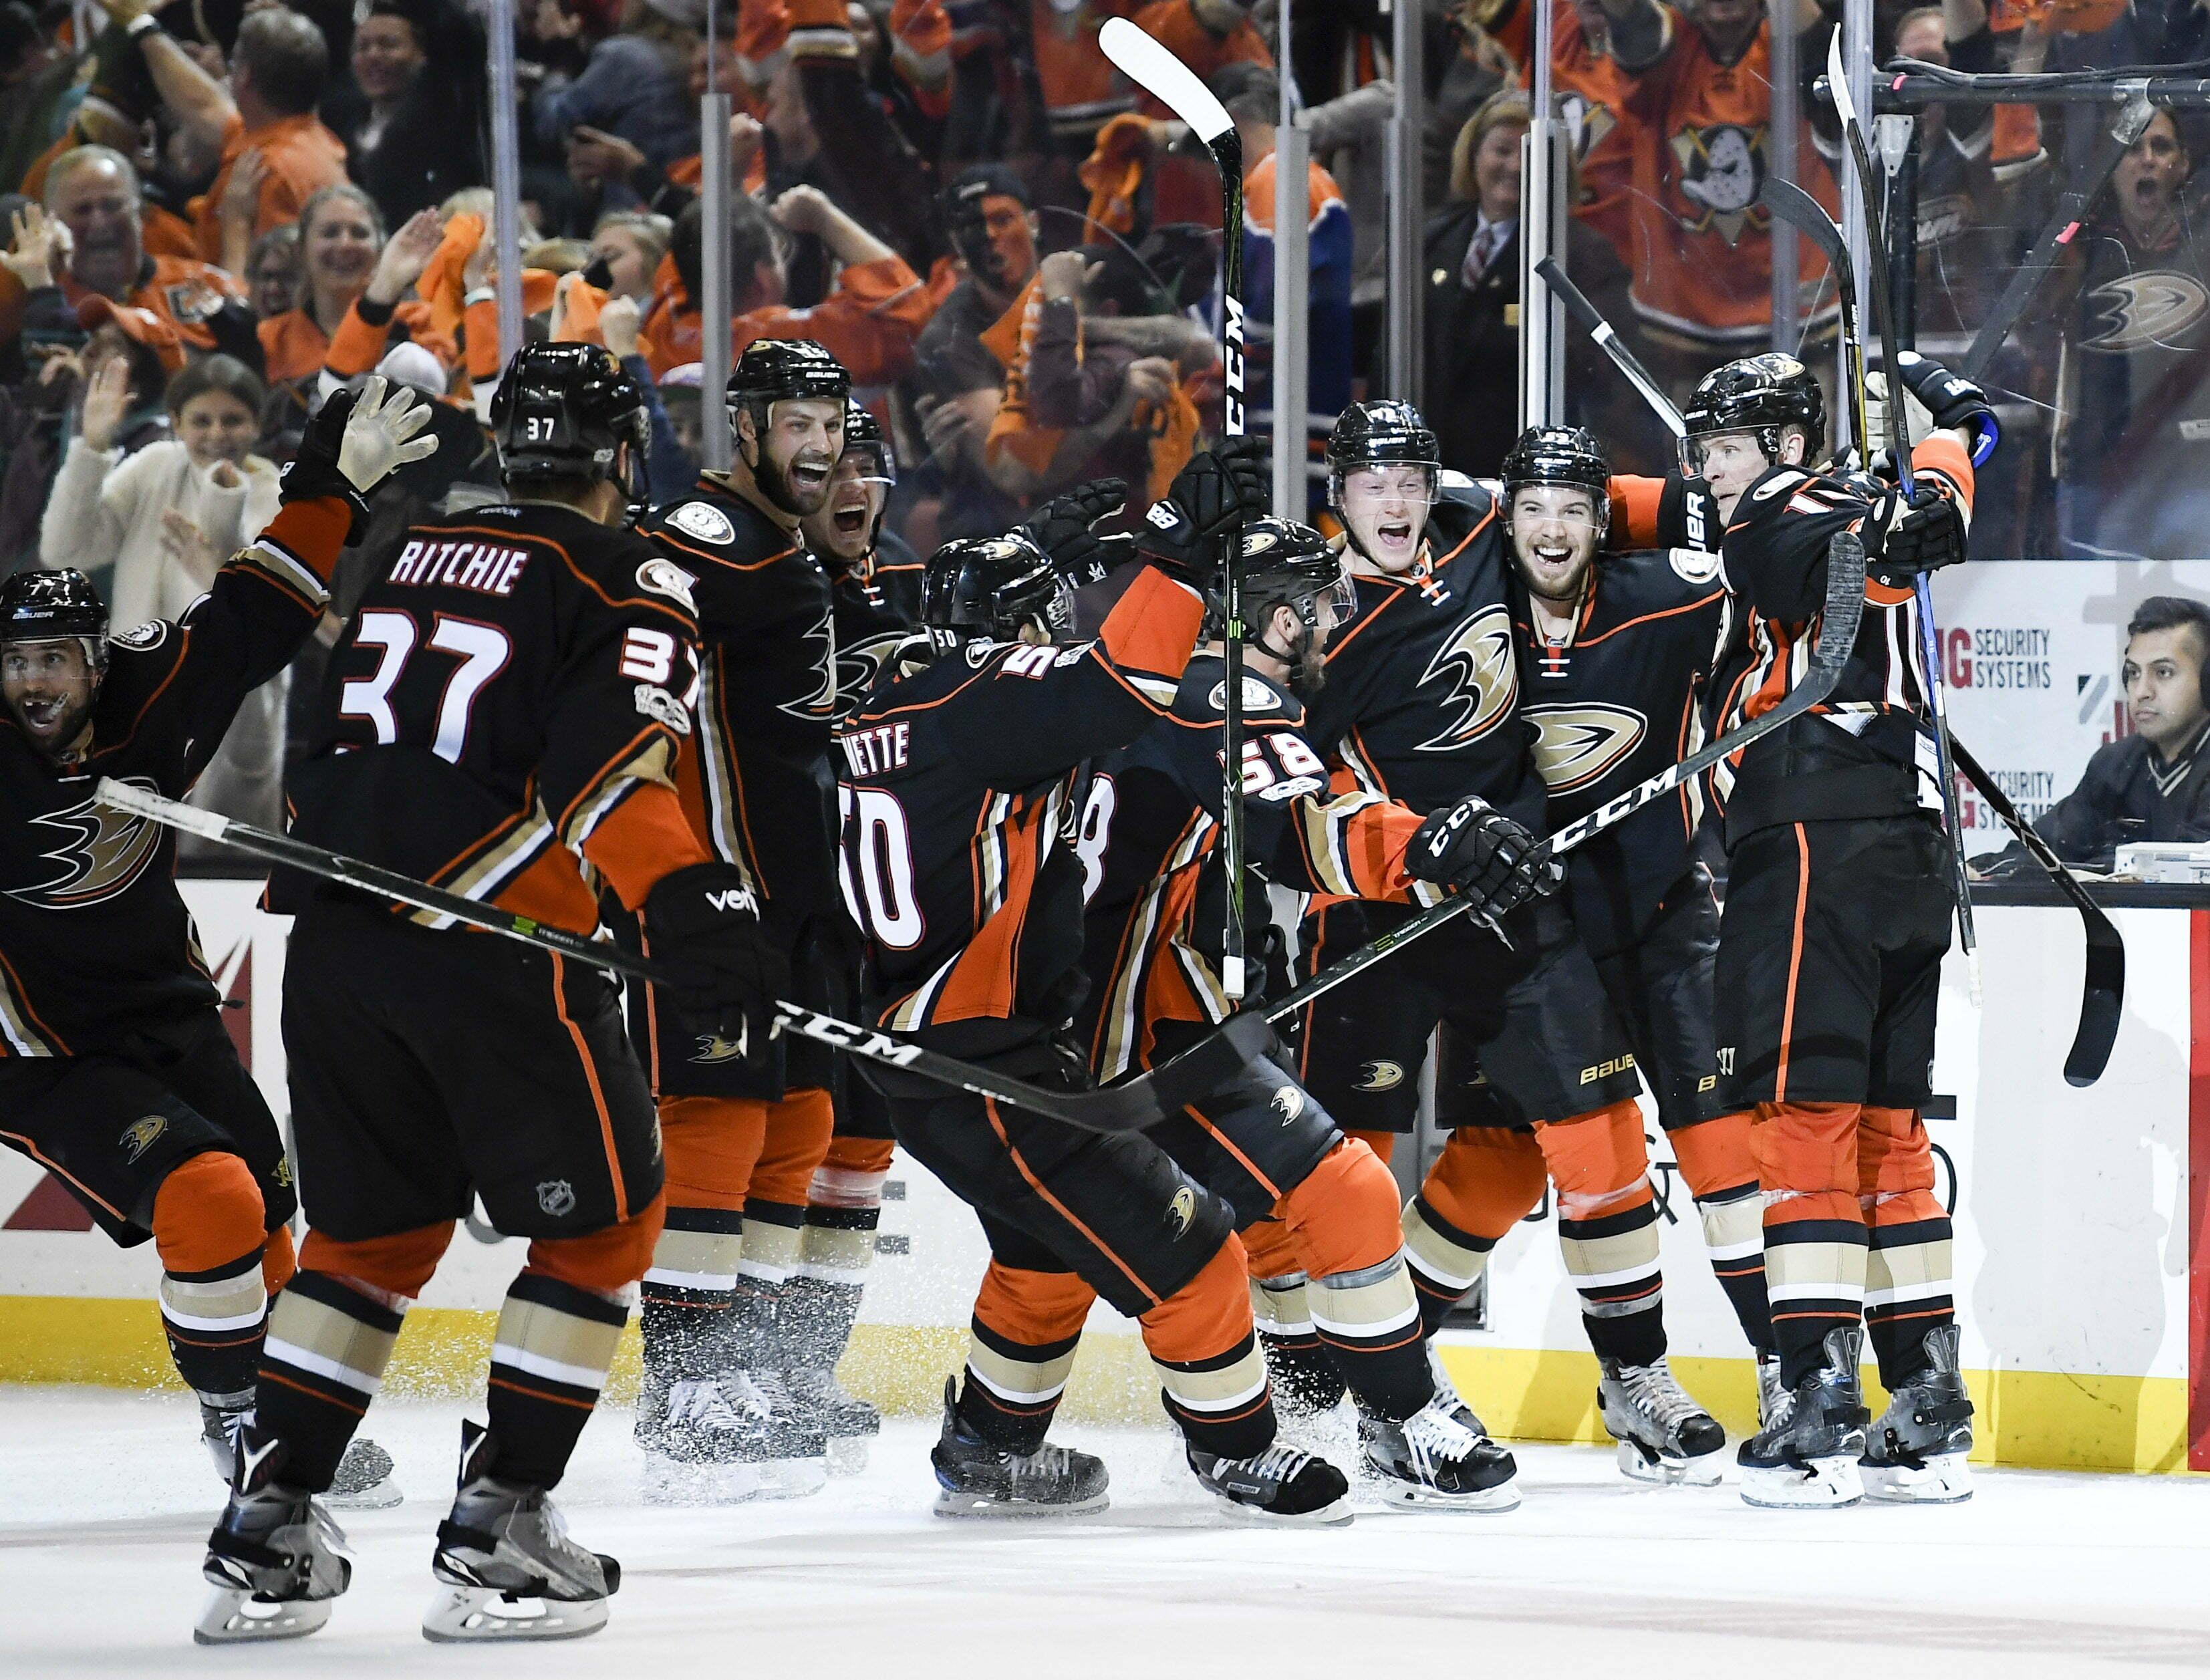 San Manuel Casino Intensifies Bond Between Anaheim Ducks